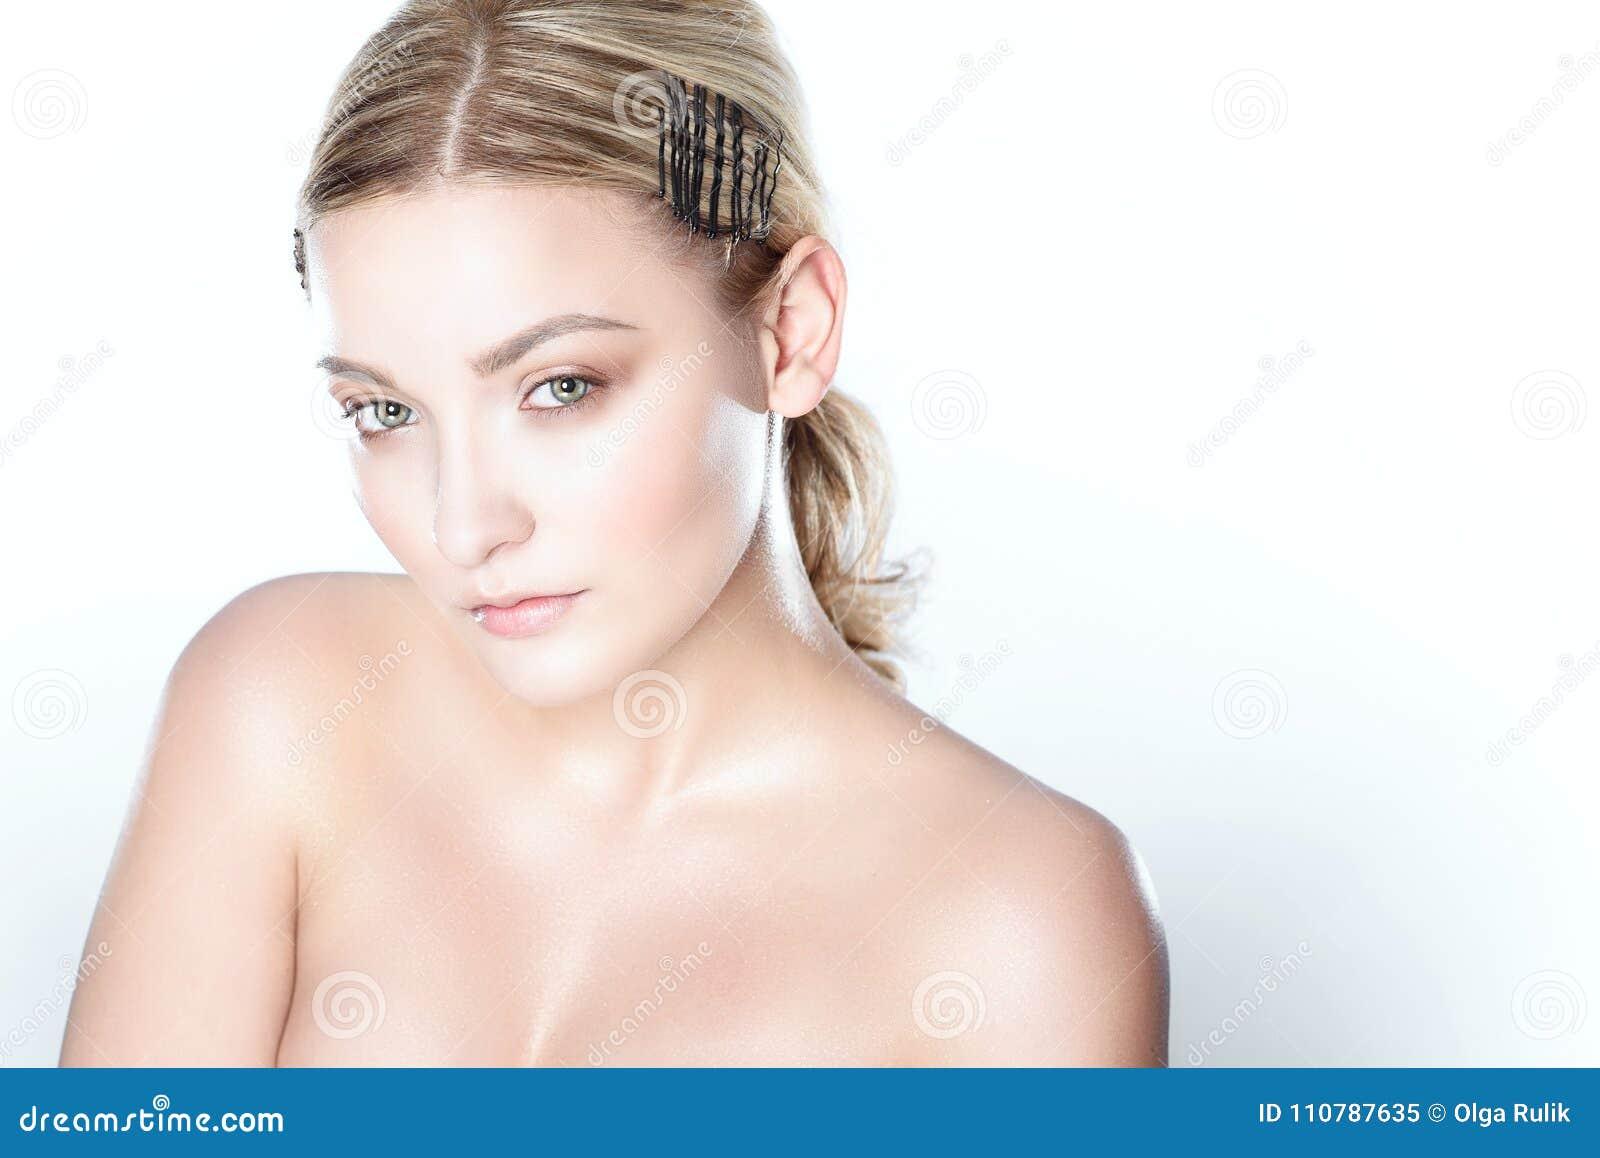 Sex therapist nj